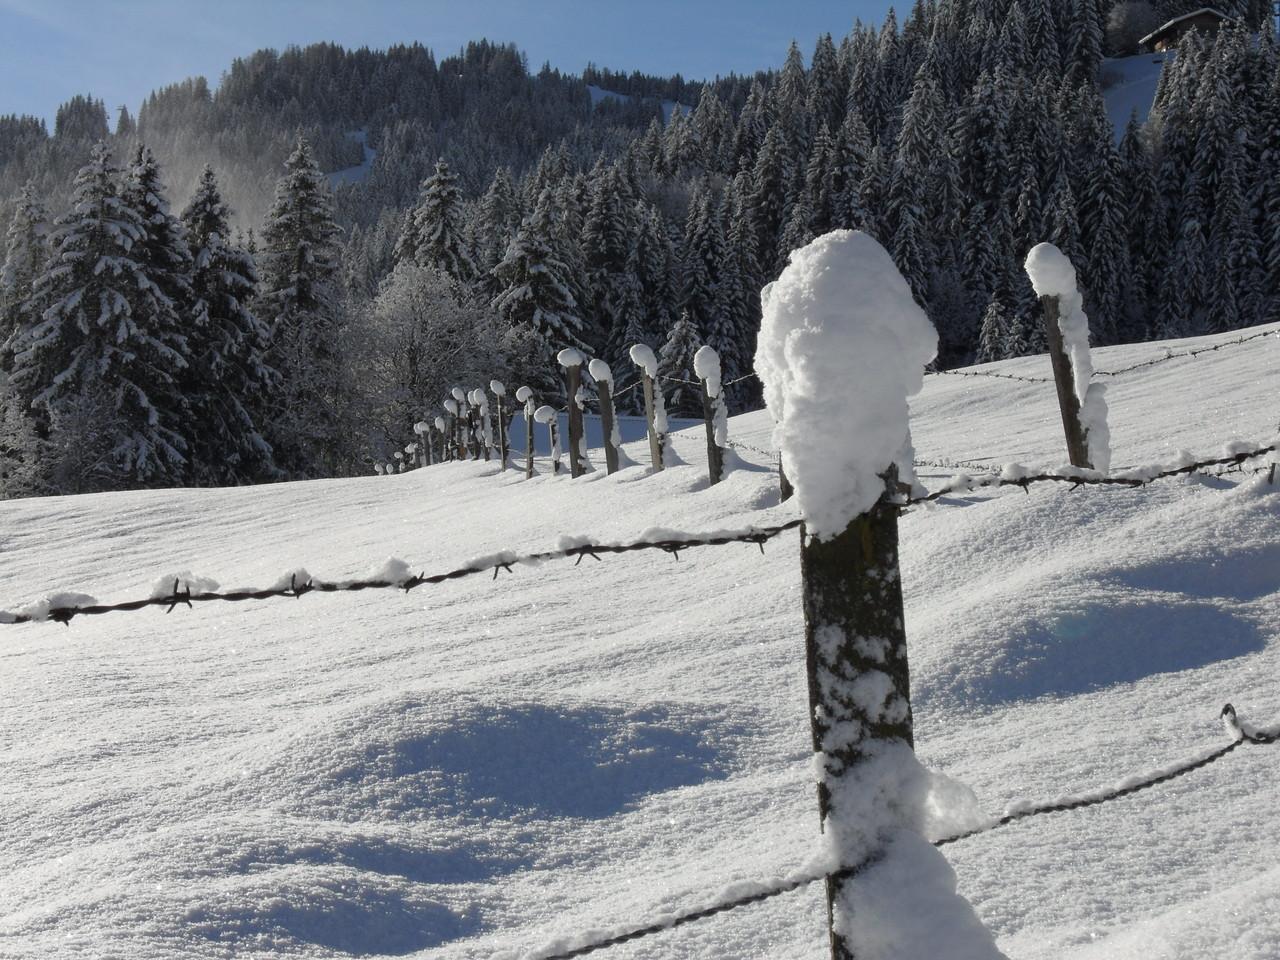 Winter, 19. Dezember 2012